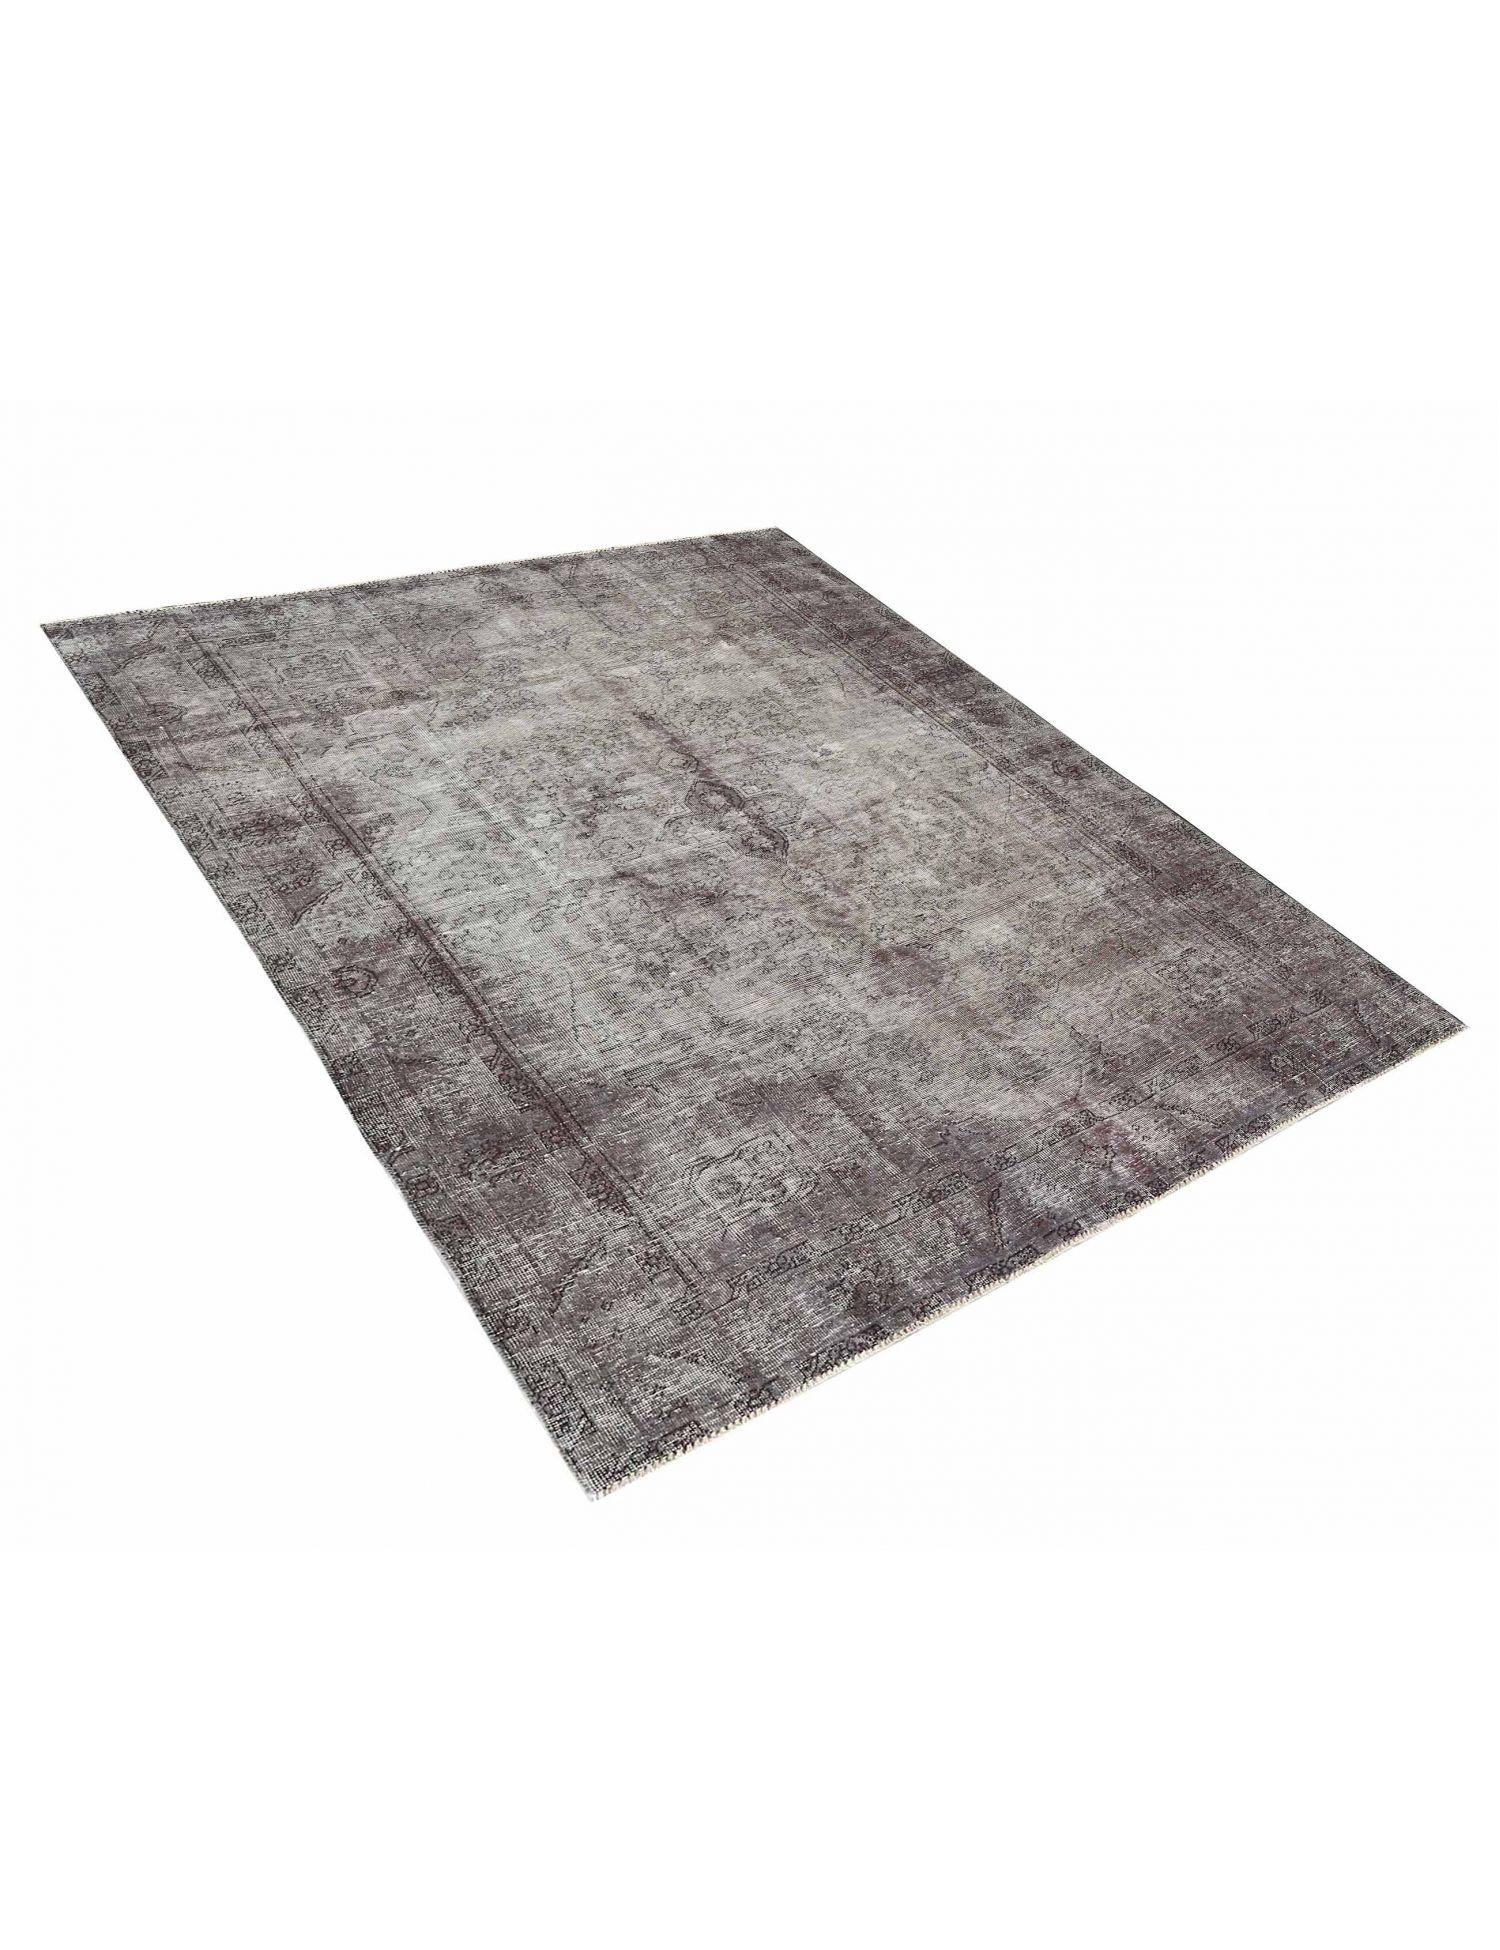 Vintage Perserteppich  grau <br/>277 x 190 cm